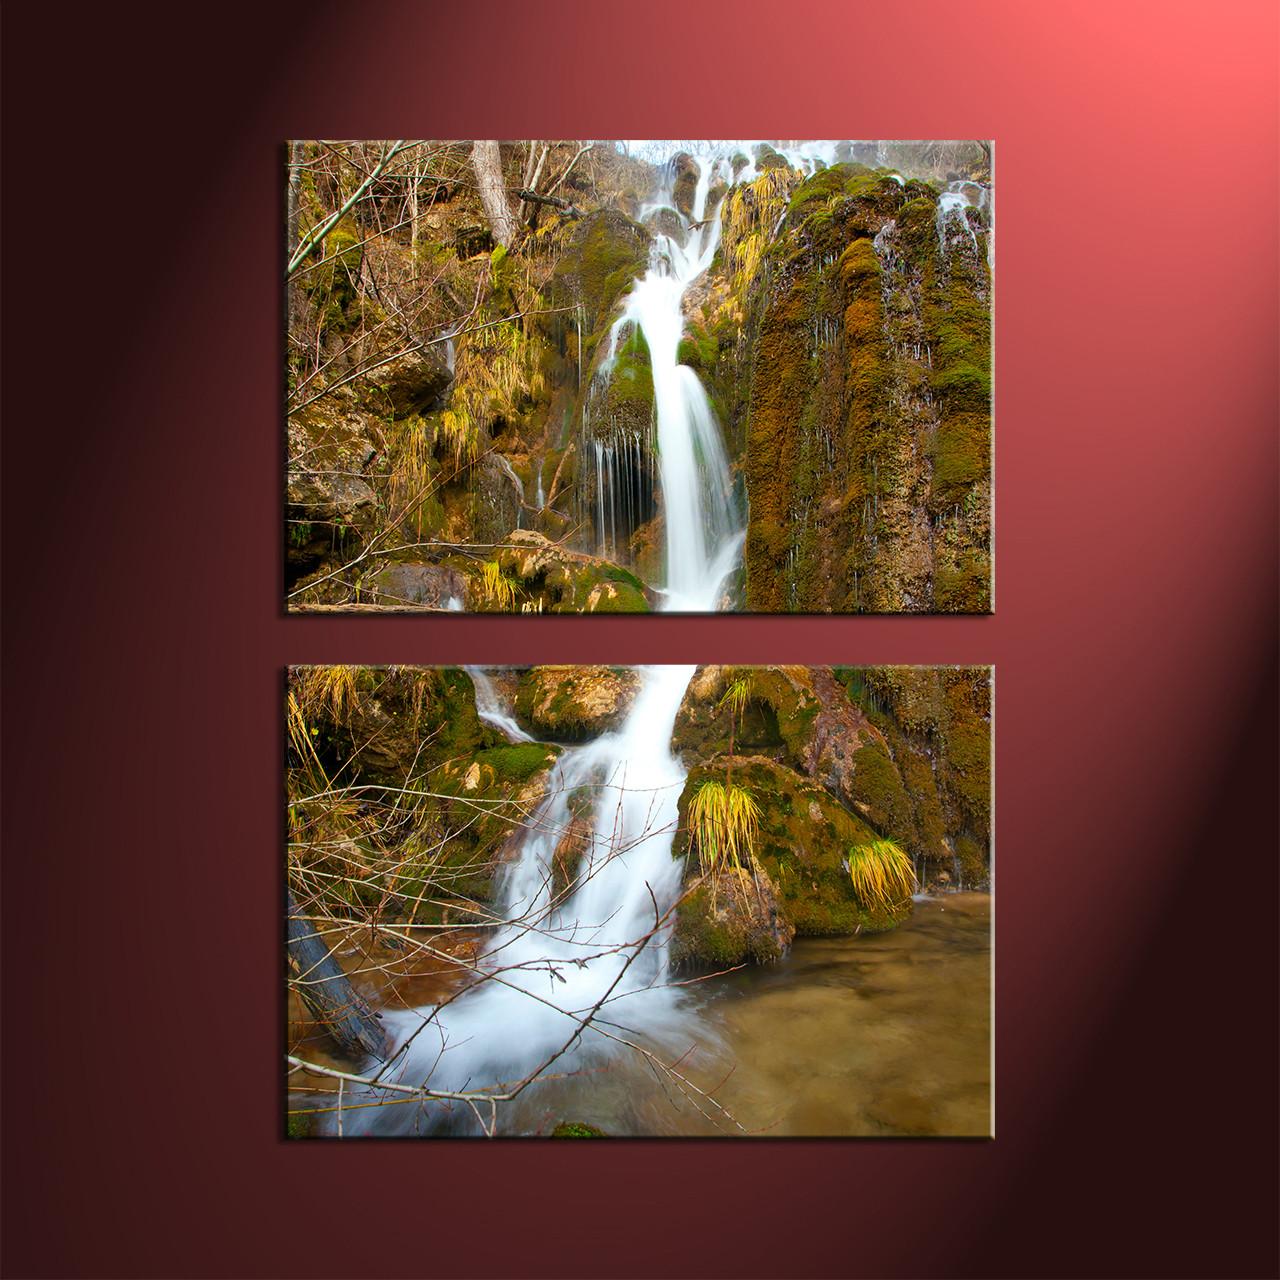 Waterfall Wall Art 2 piece green scenery waterfall wall art